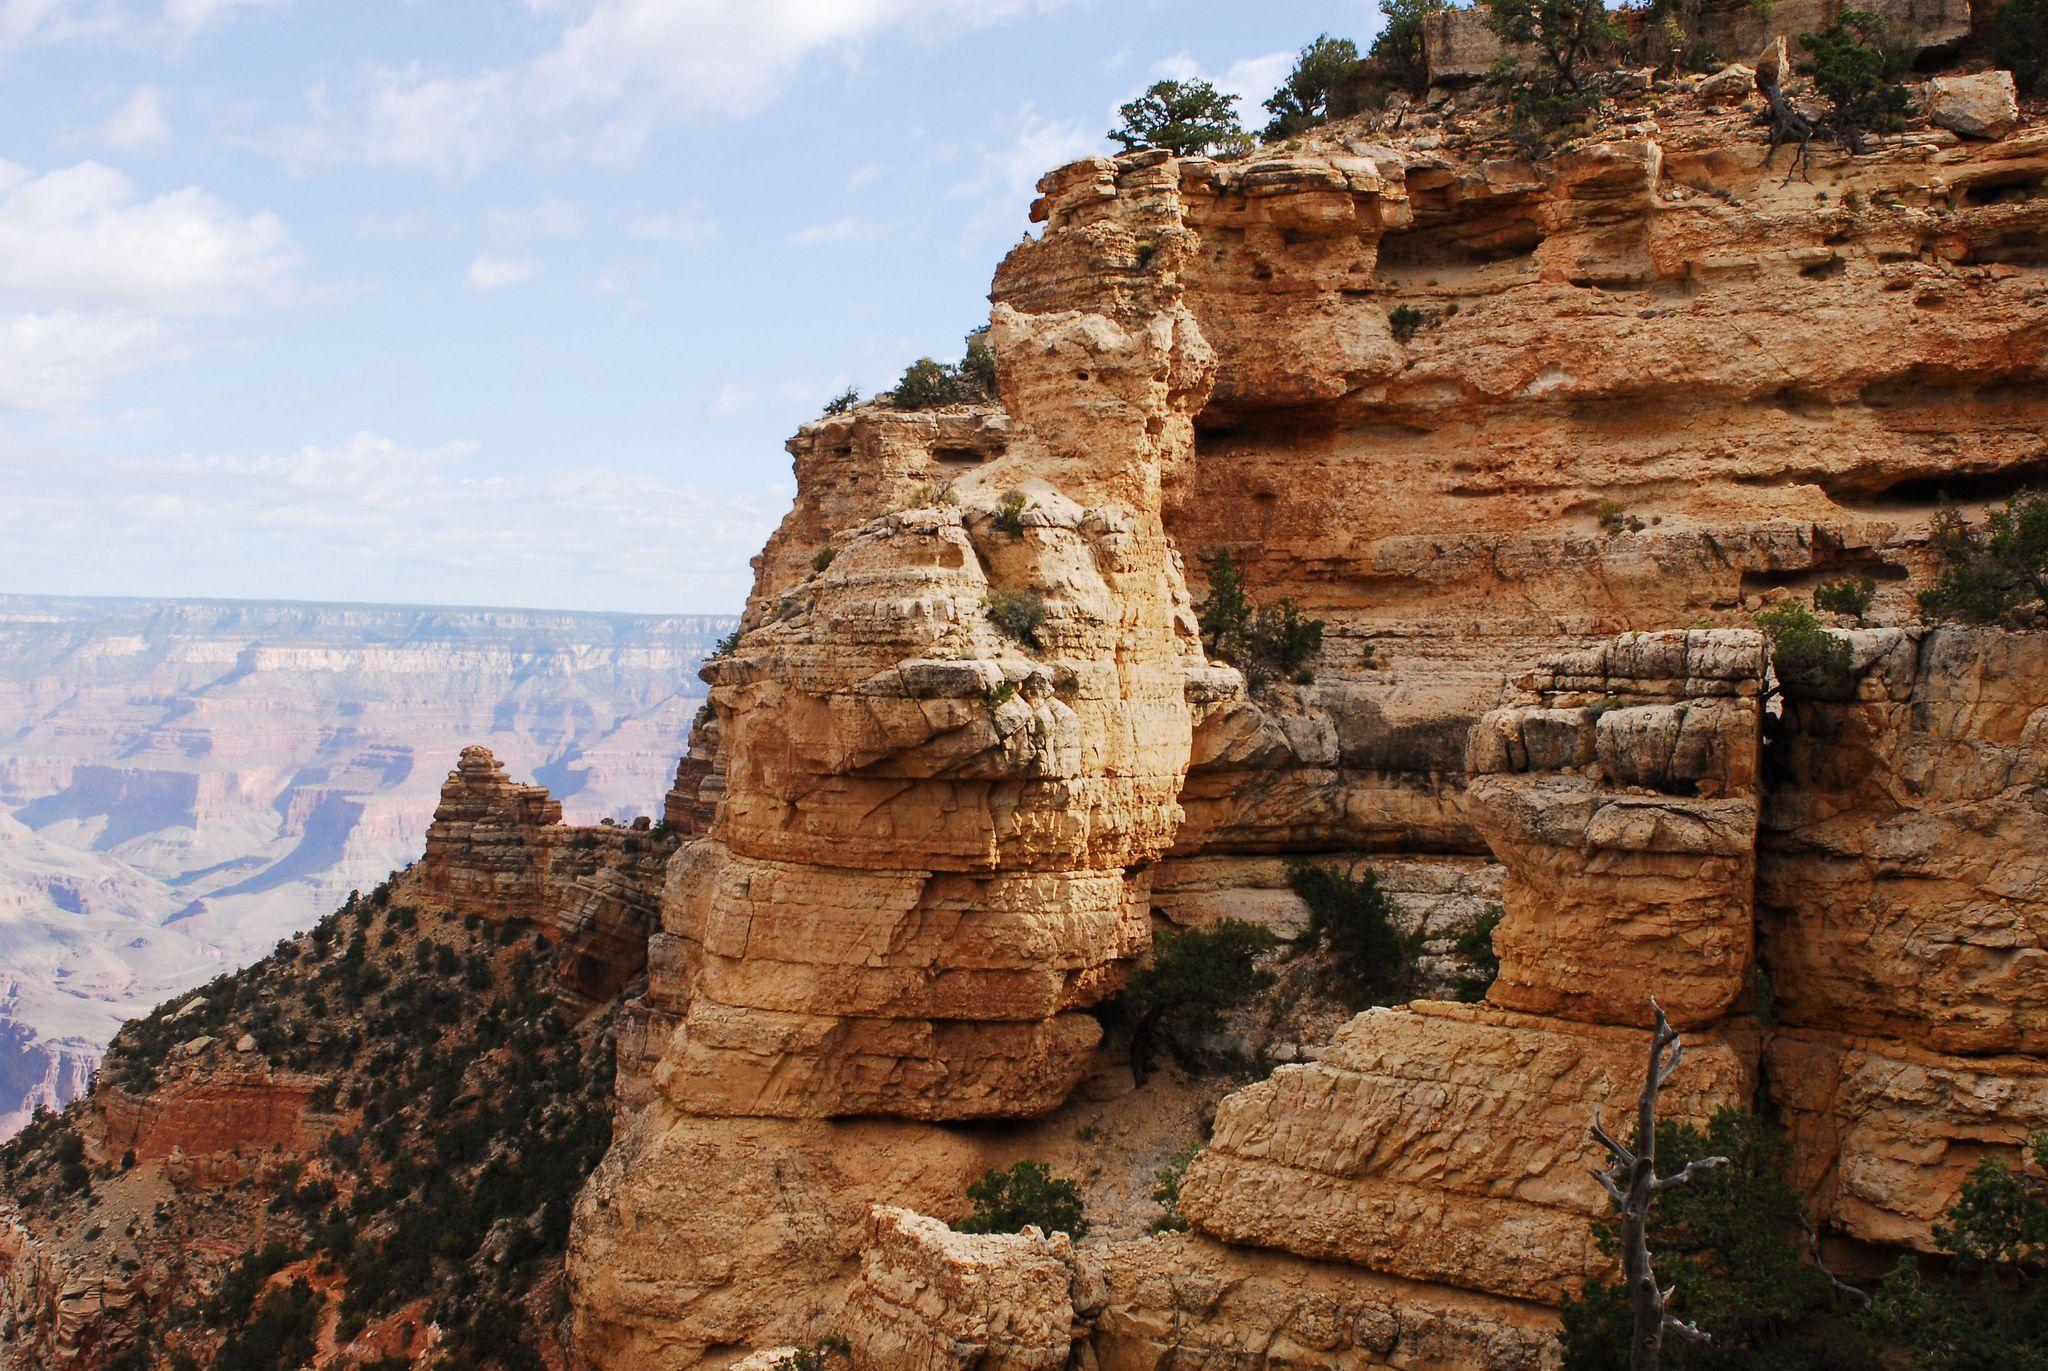 Geologic Time Scale The Paleozoic Era